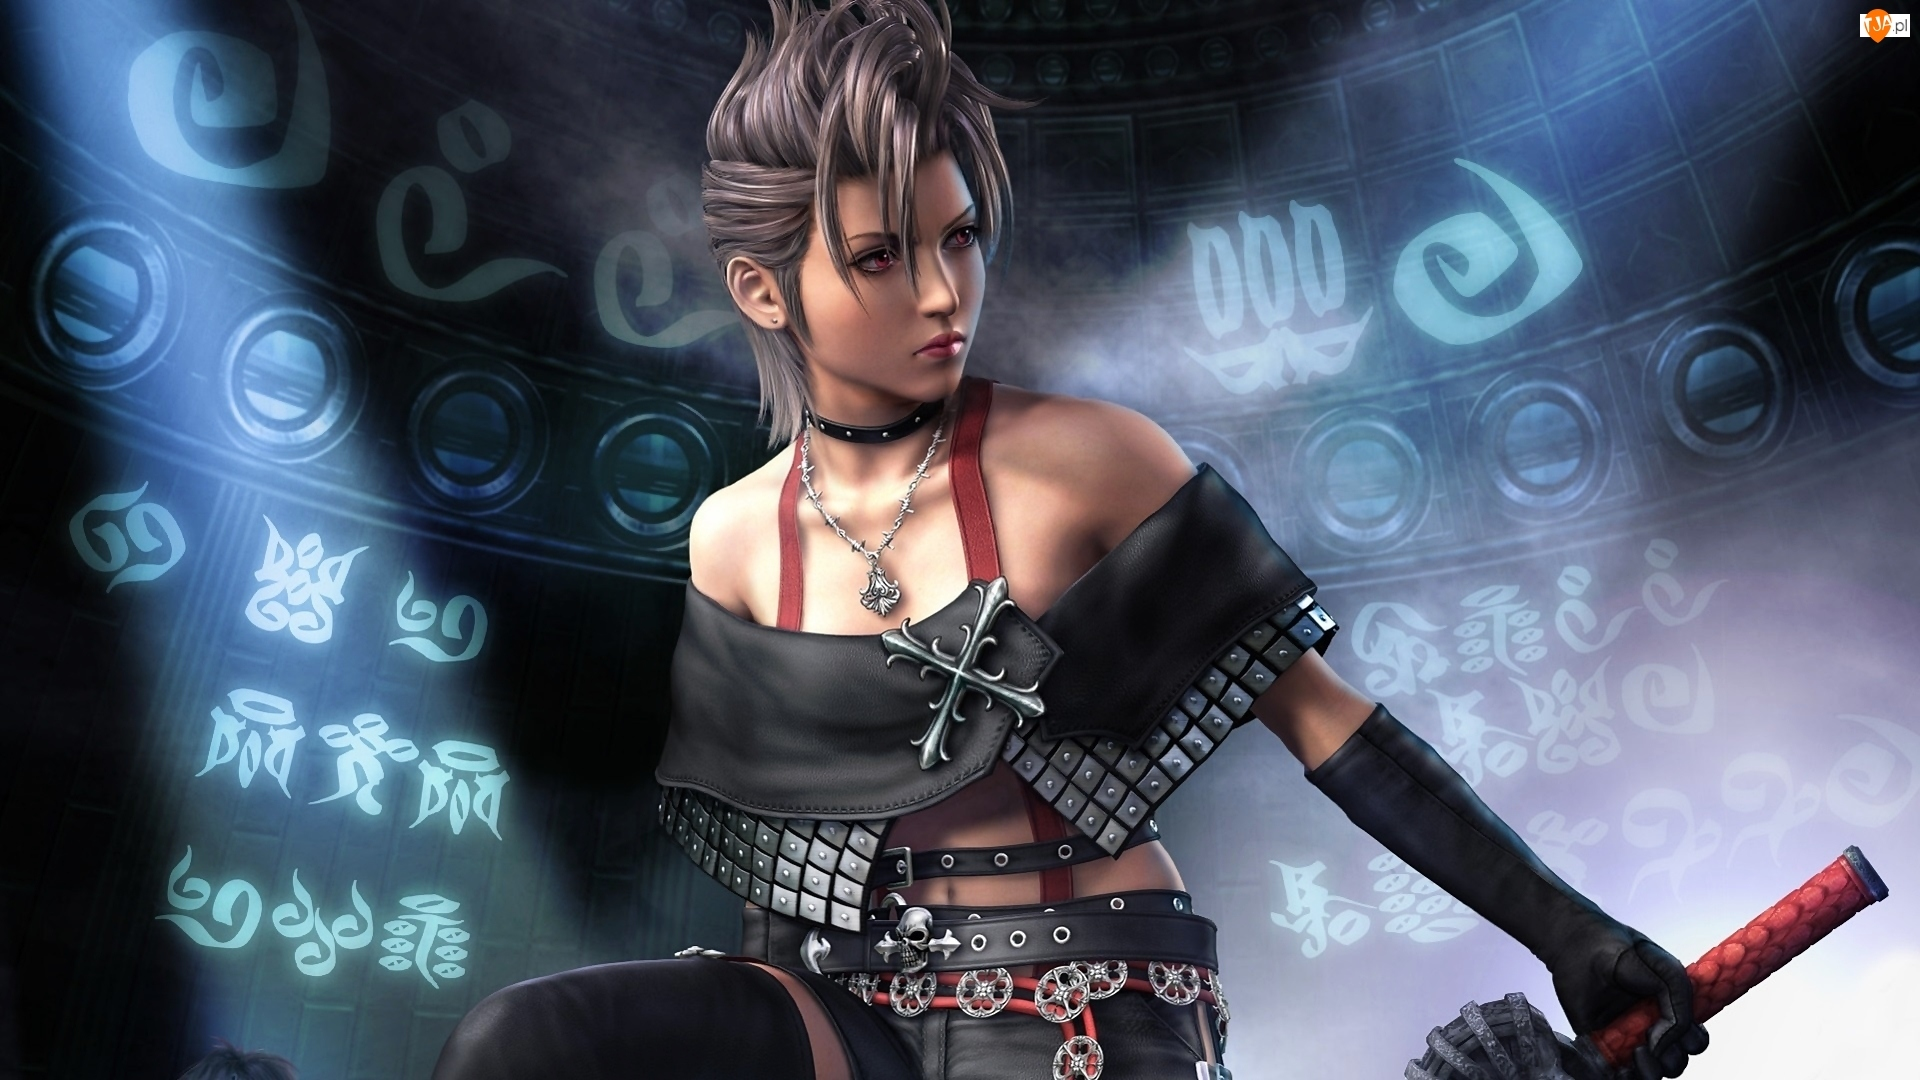 Final Fantasy X-2, Strój, Kobieta, Skórzany